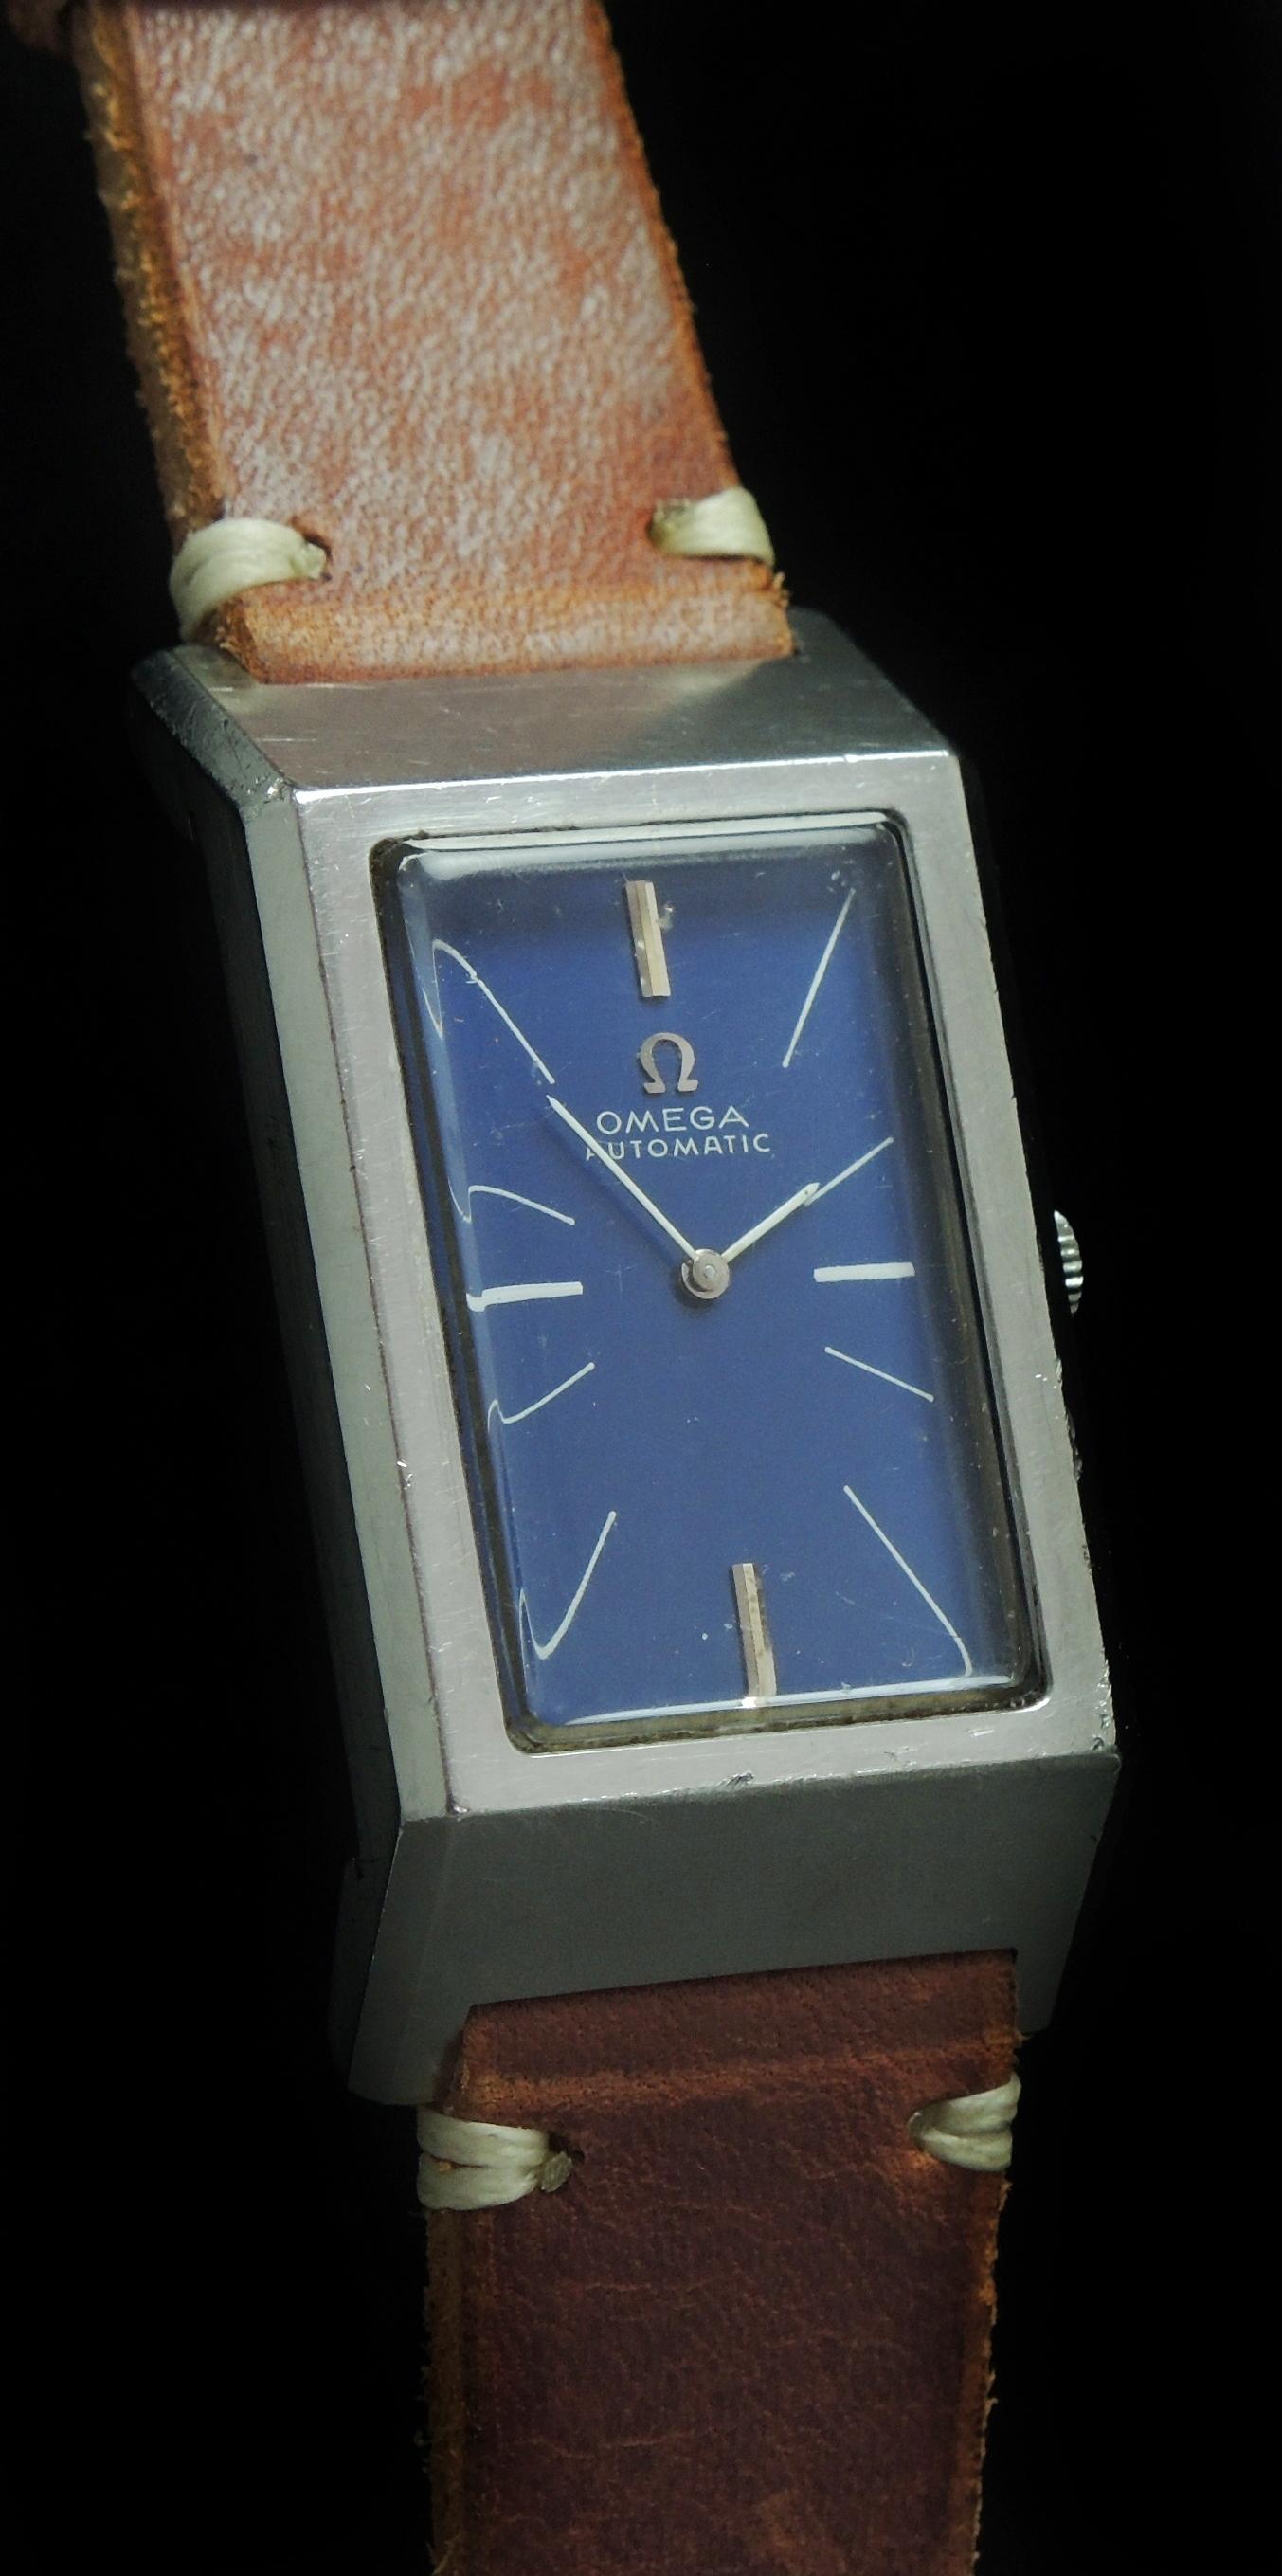 Armbanduhren im Vintage-OMEGA eBay